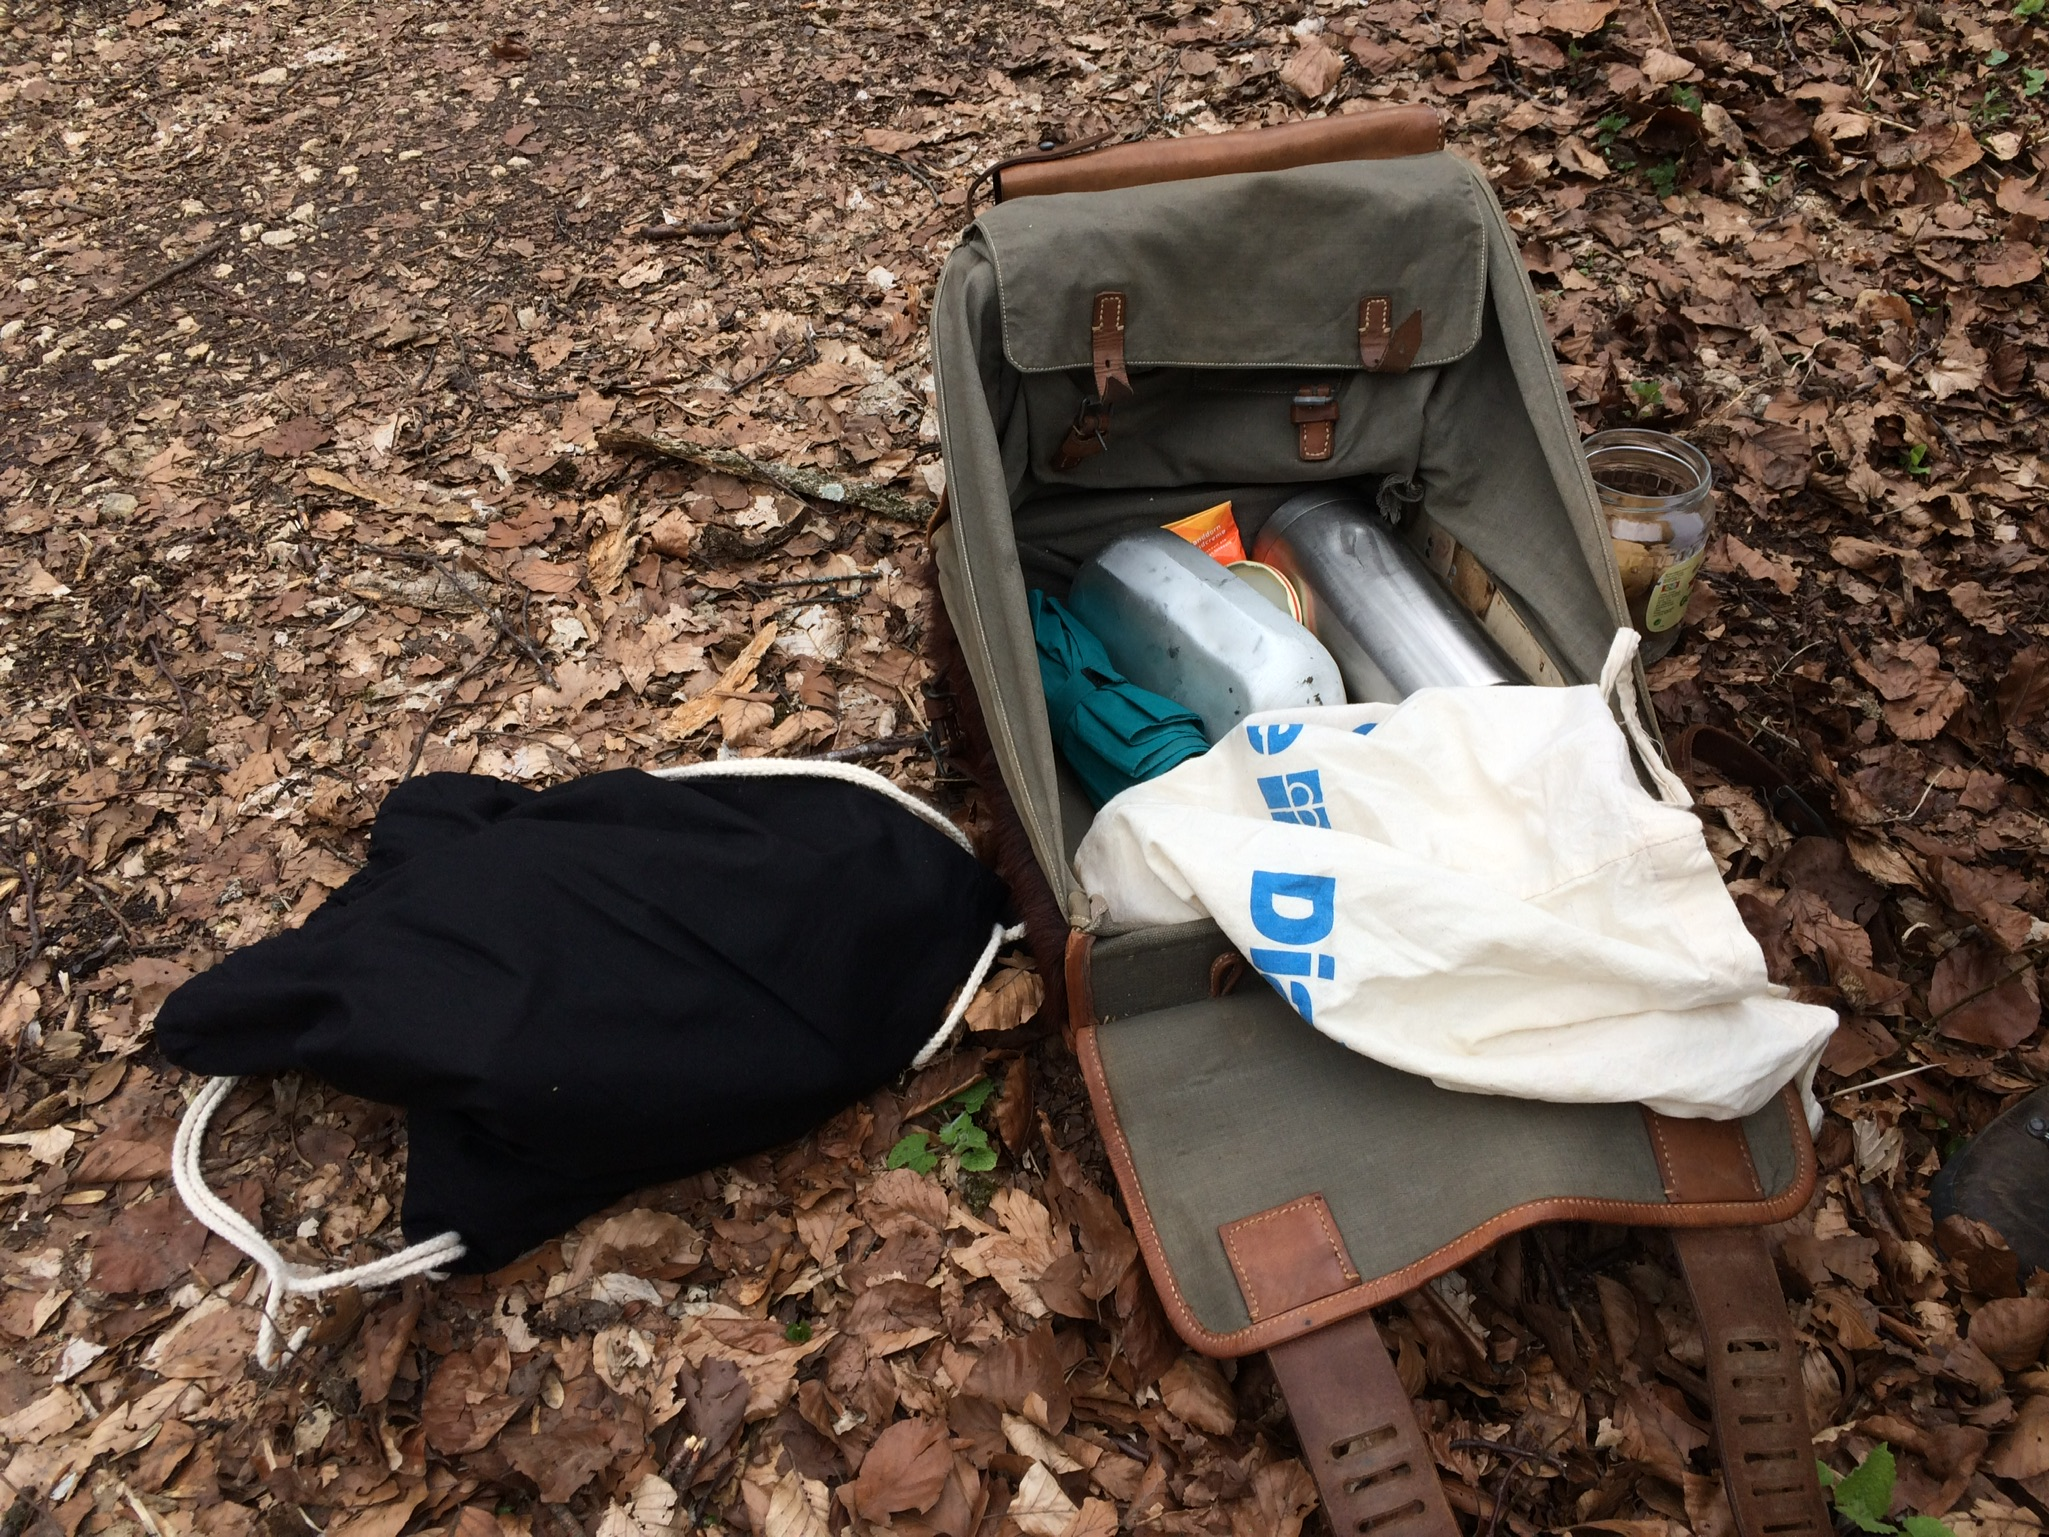 Plastikfrei wandern – Teil 2